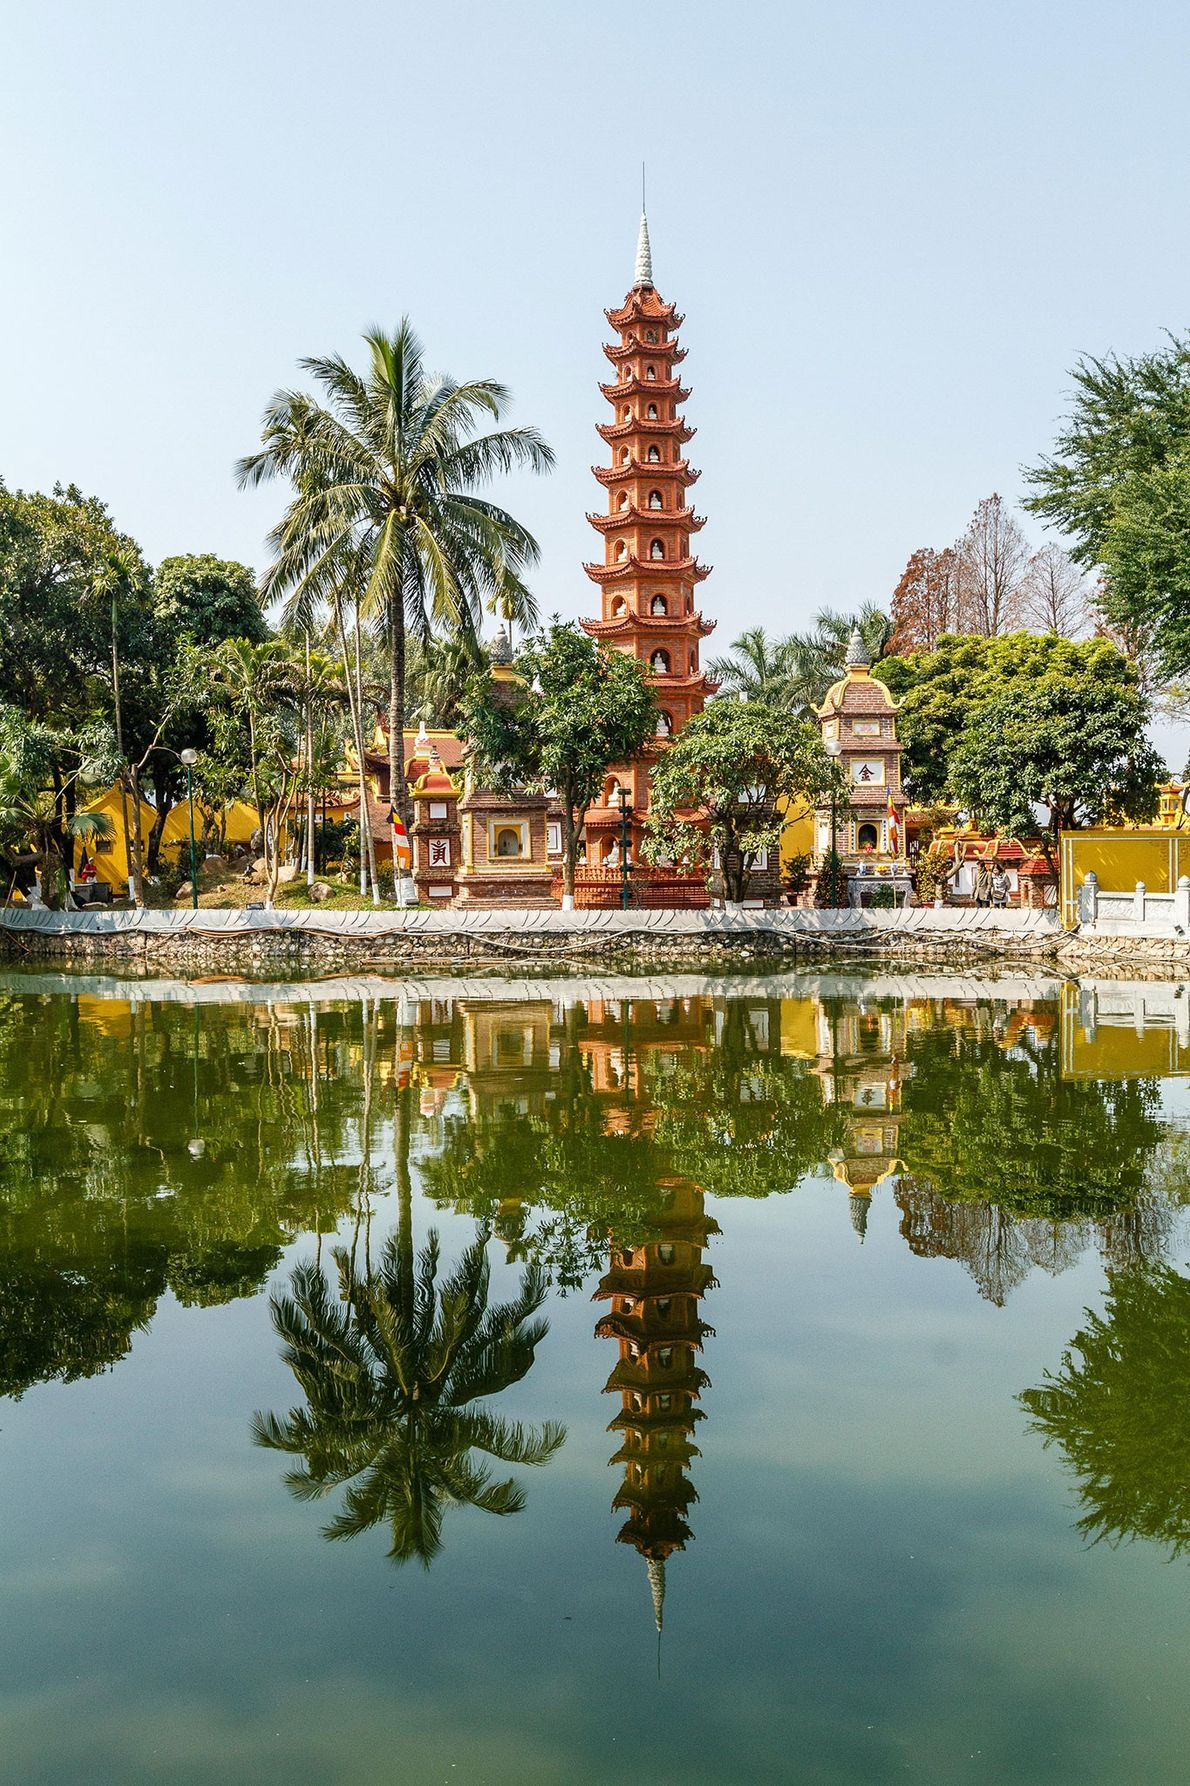 TrẤn QuỐc Pagoda, Vietnam